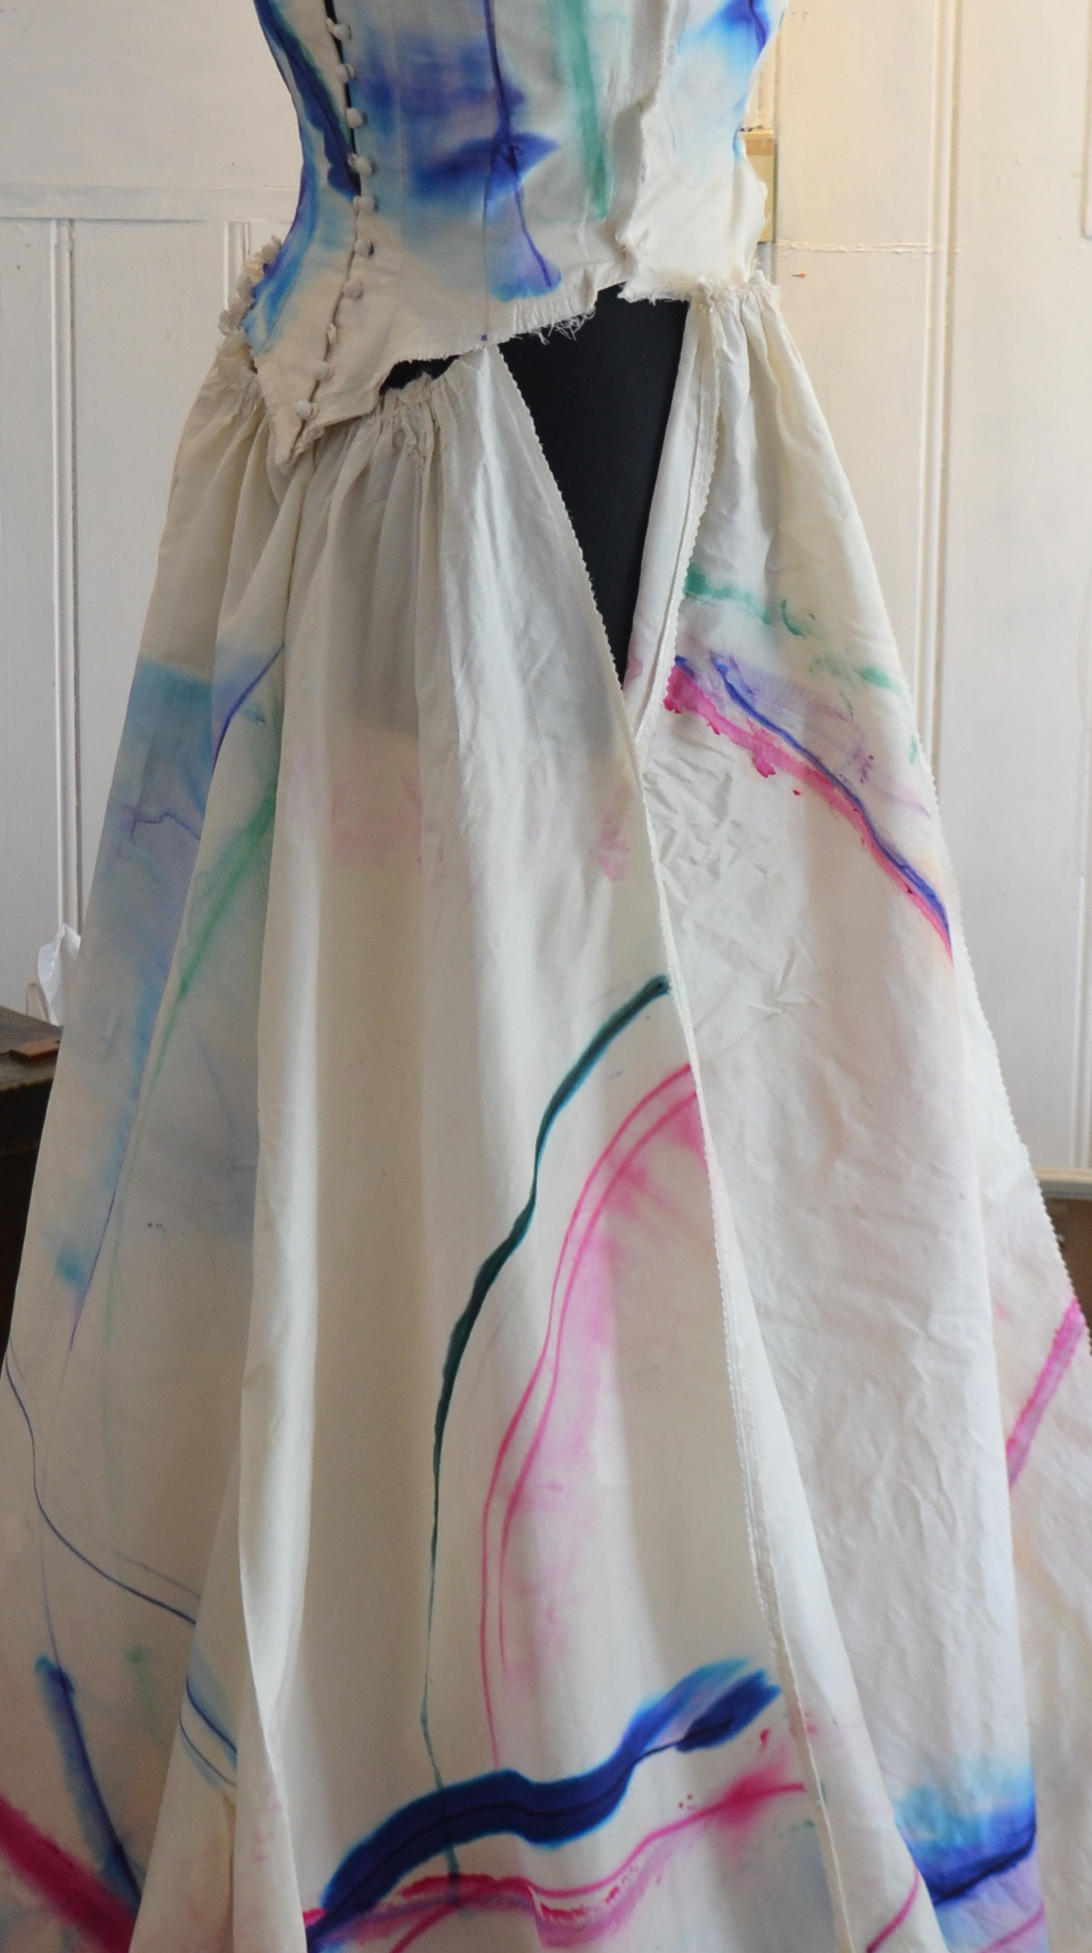 Dyed Wedding Dress week 4